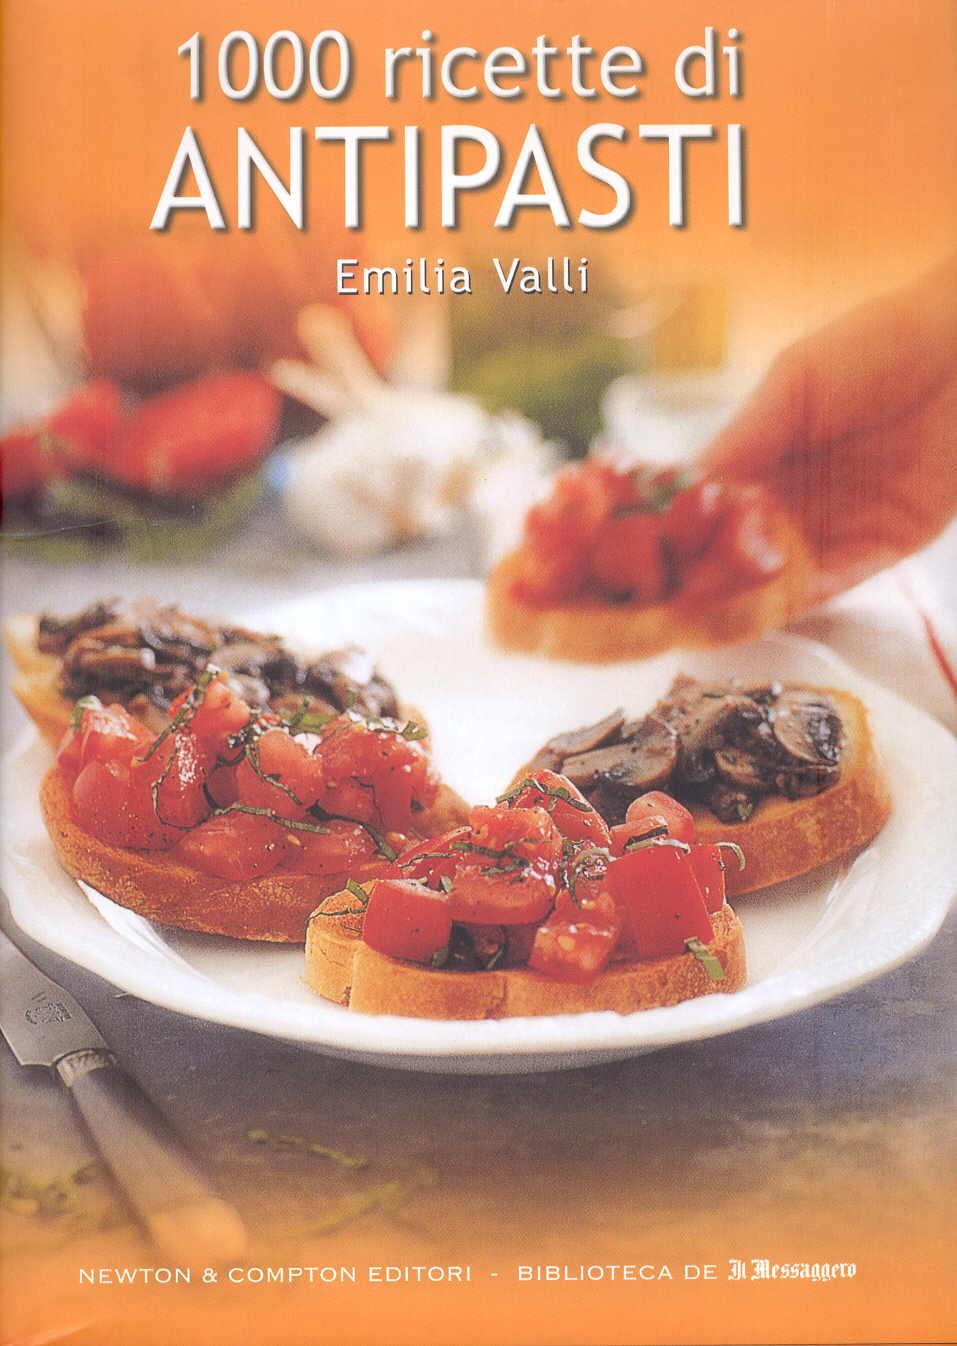 1000 ricette di antipasti